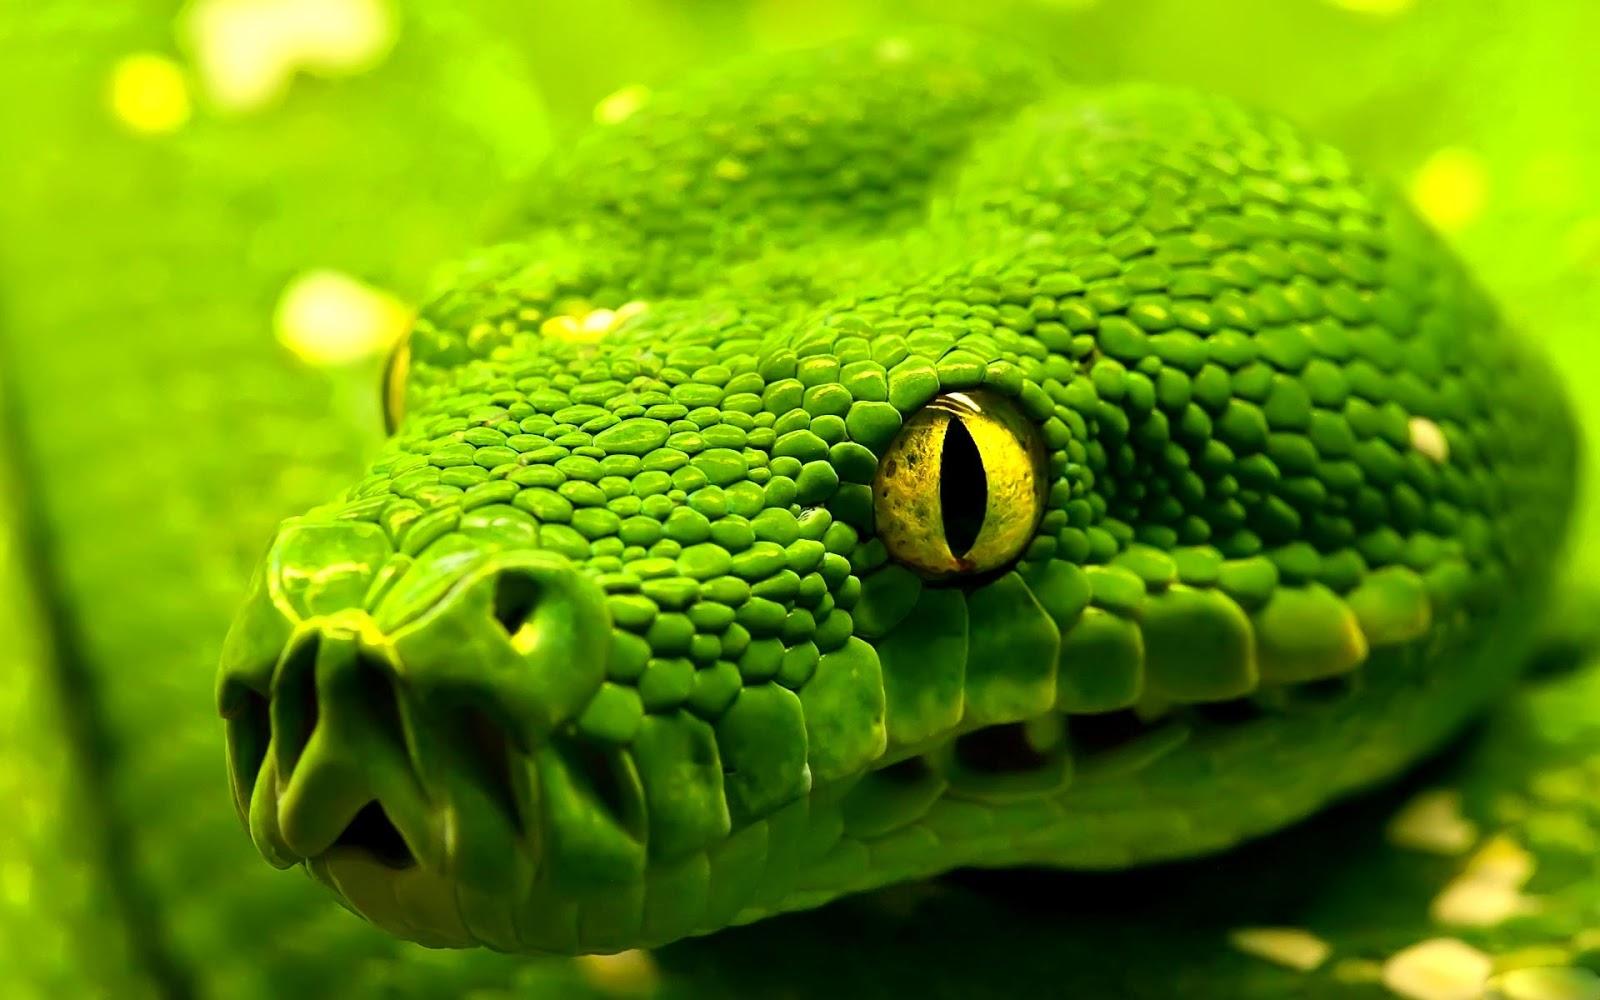 http://4.bp.blogspot.com/-C1QlszIlEb0/TiOc7tfhNzI/AAAAAAAAIQE/Oxnb5Tr3Yao/s1600/green-snake-head-hd-wallpaper.jpg